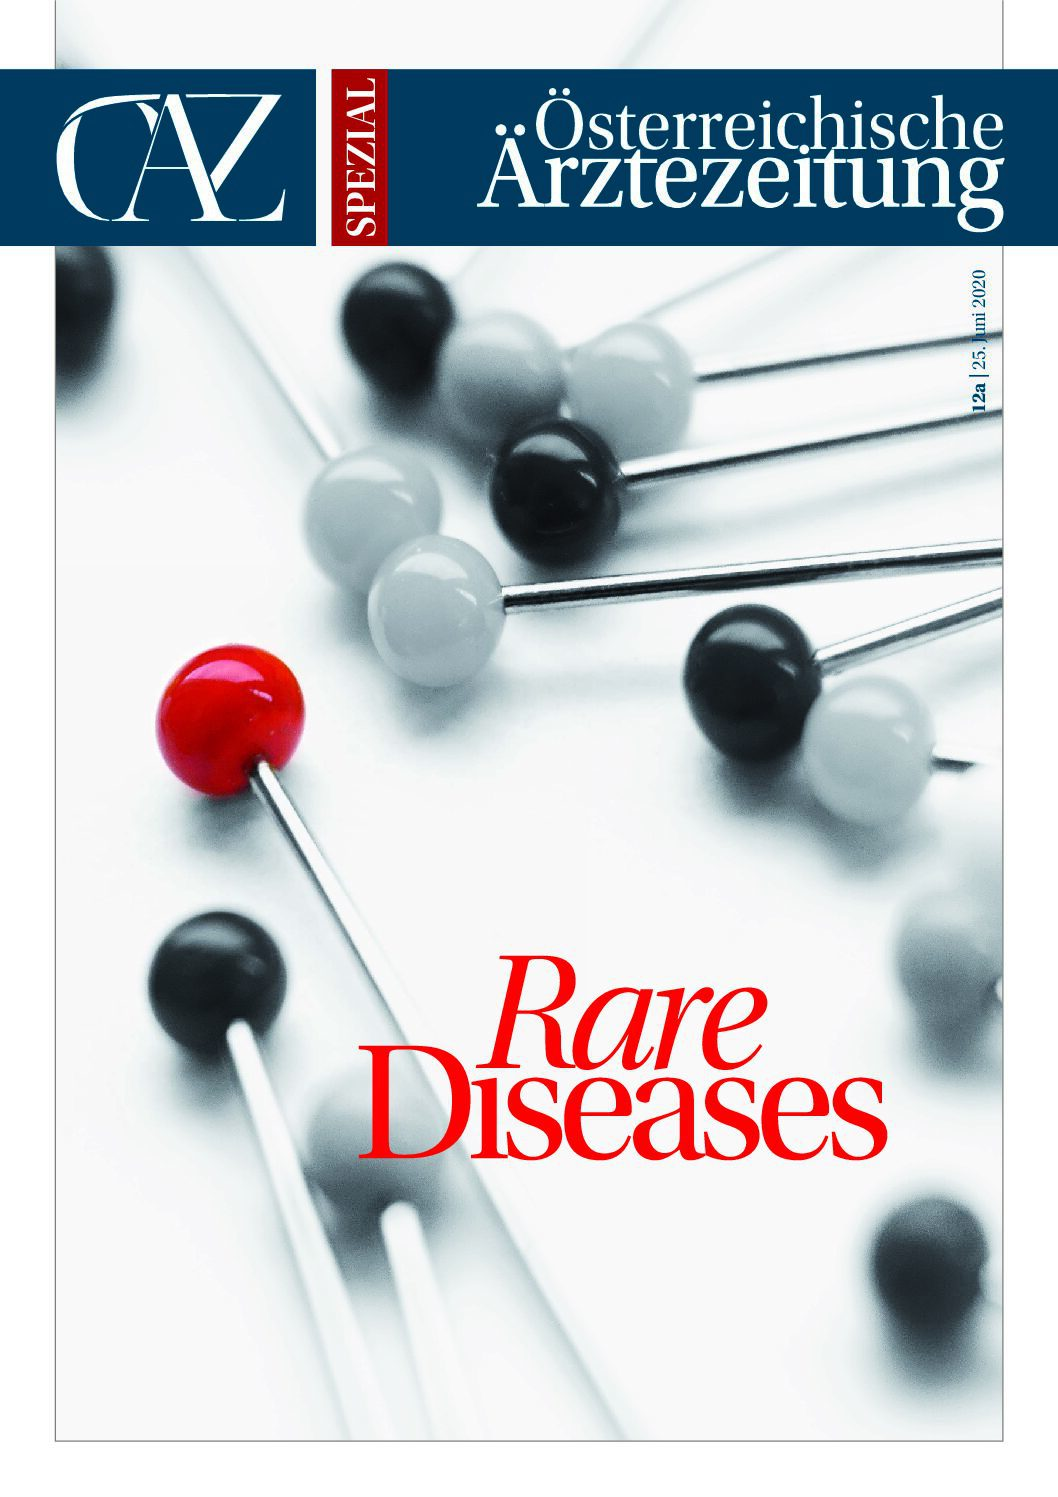 OAZ Spezial Rare Diseases 2020